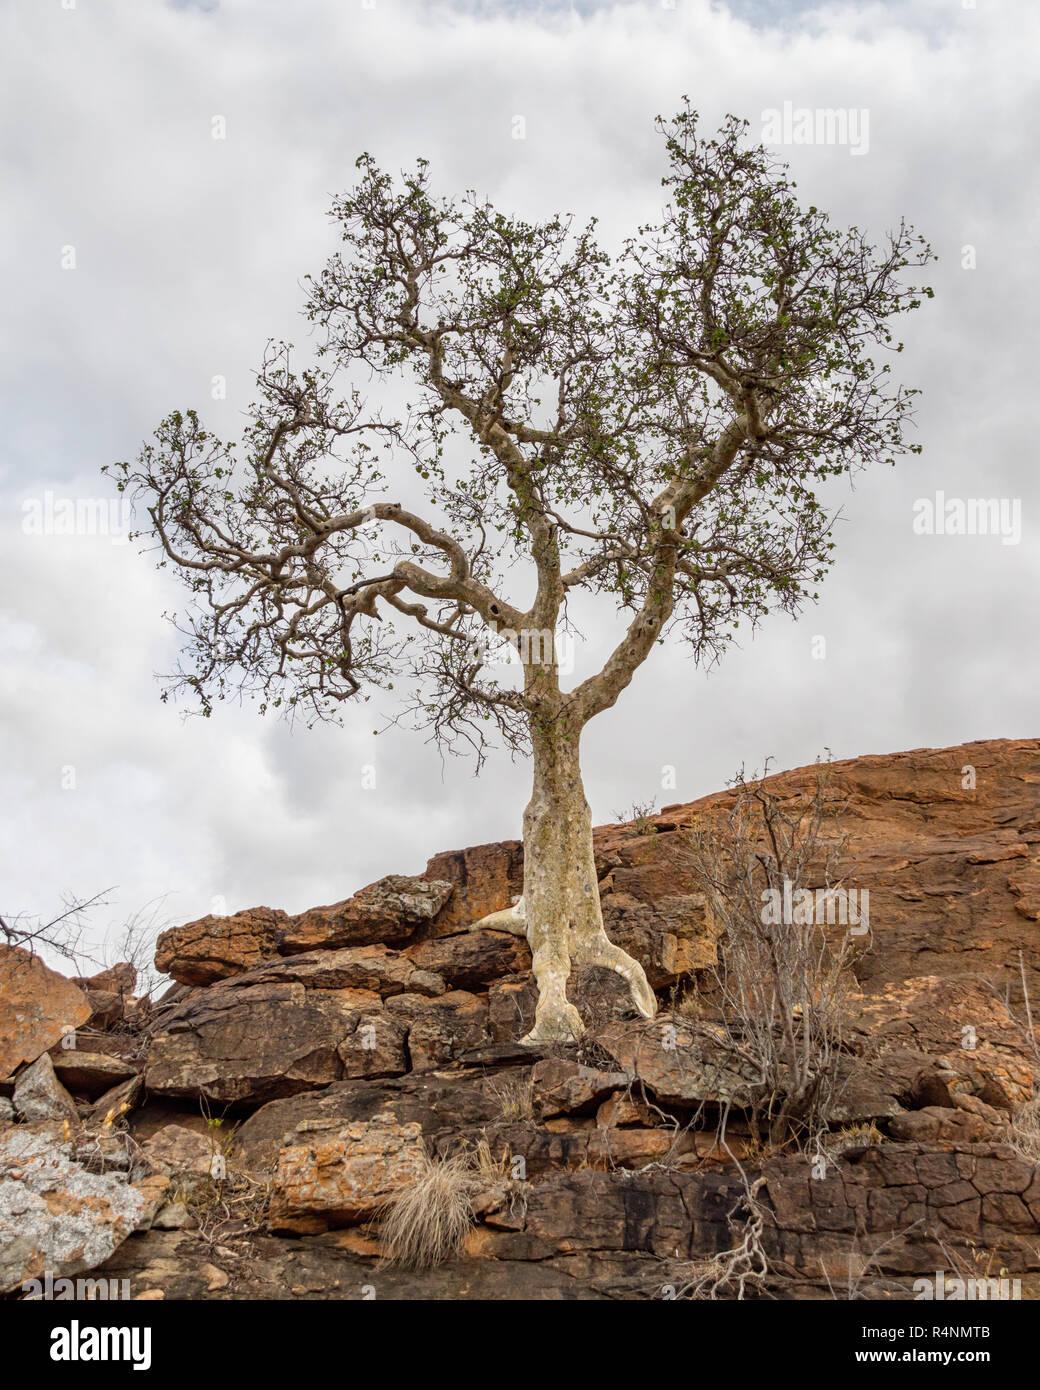 African Rock Fig Fresh Seeds Rock Splitting Tree